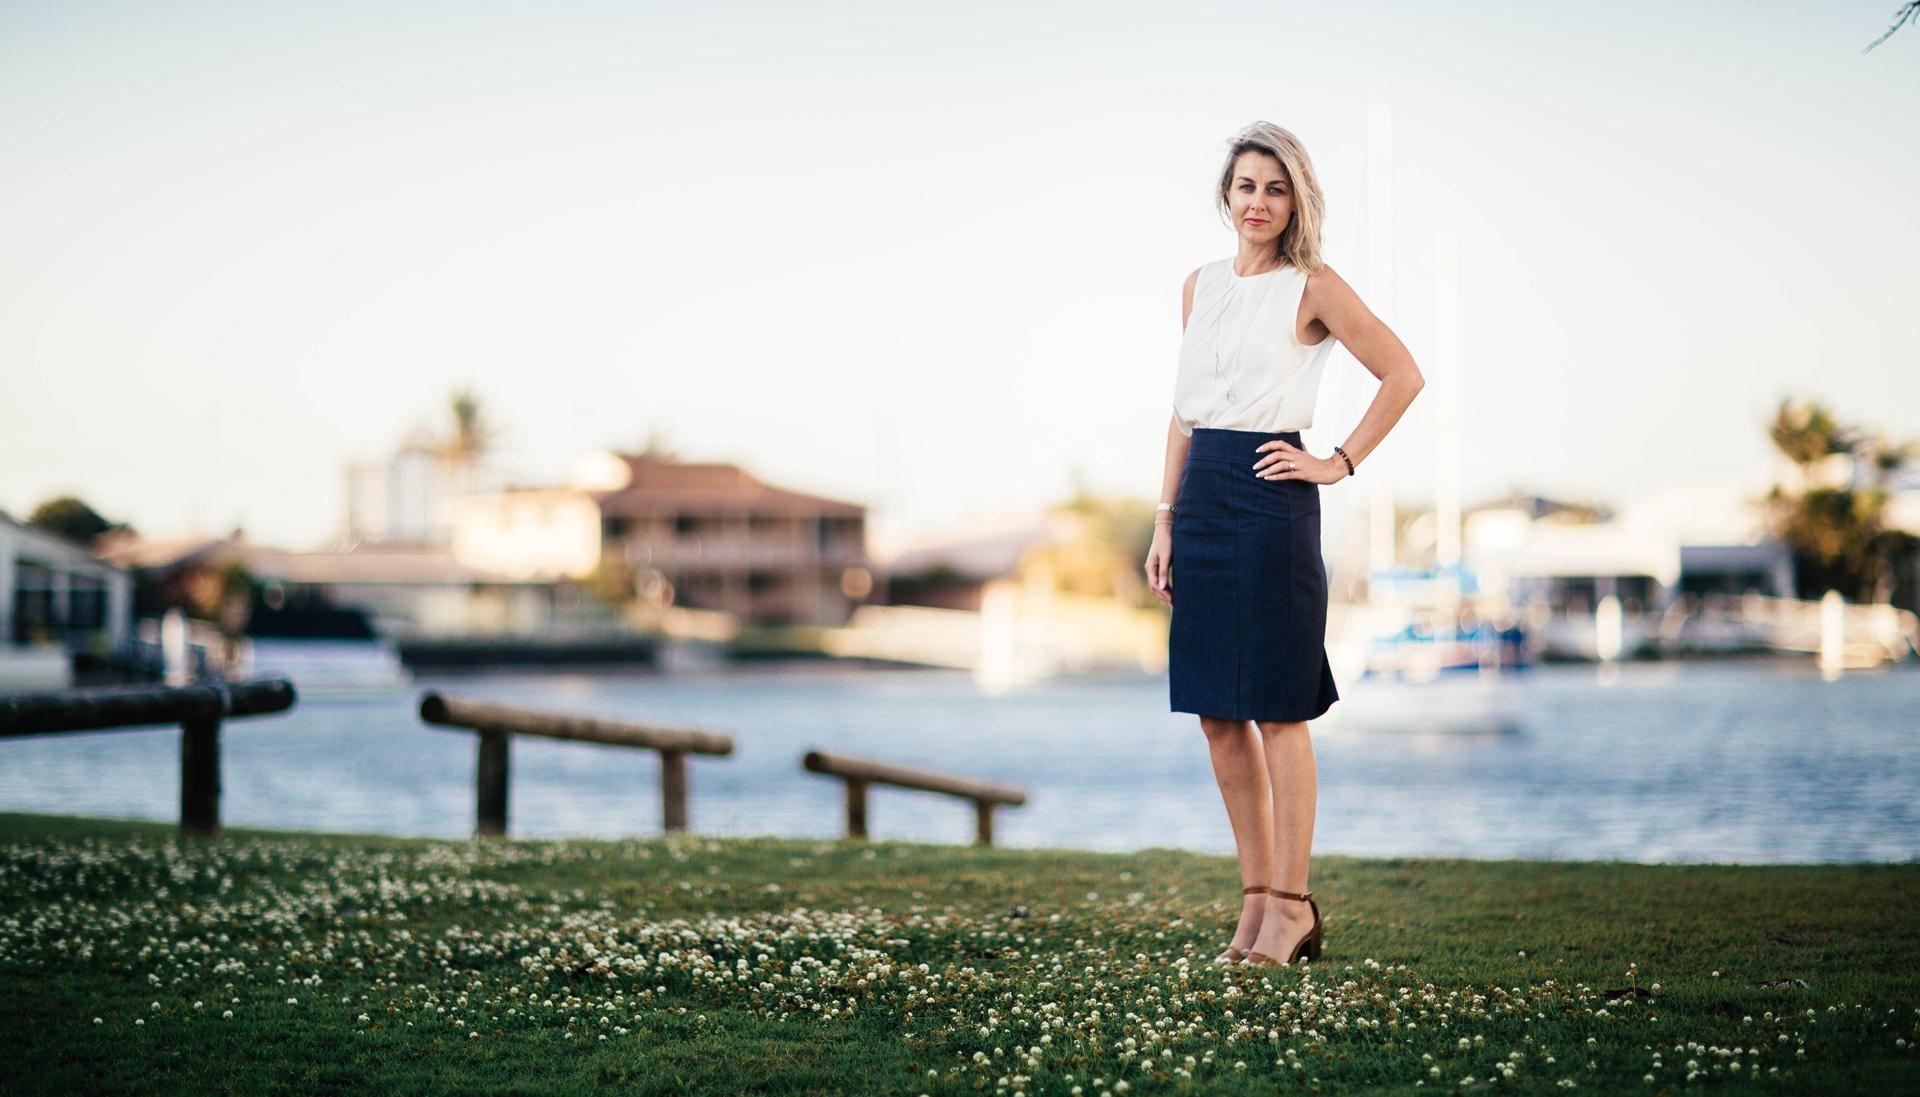 managing director, ADFX, advertising agency, Sunshine Coast